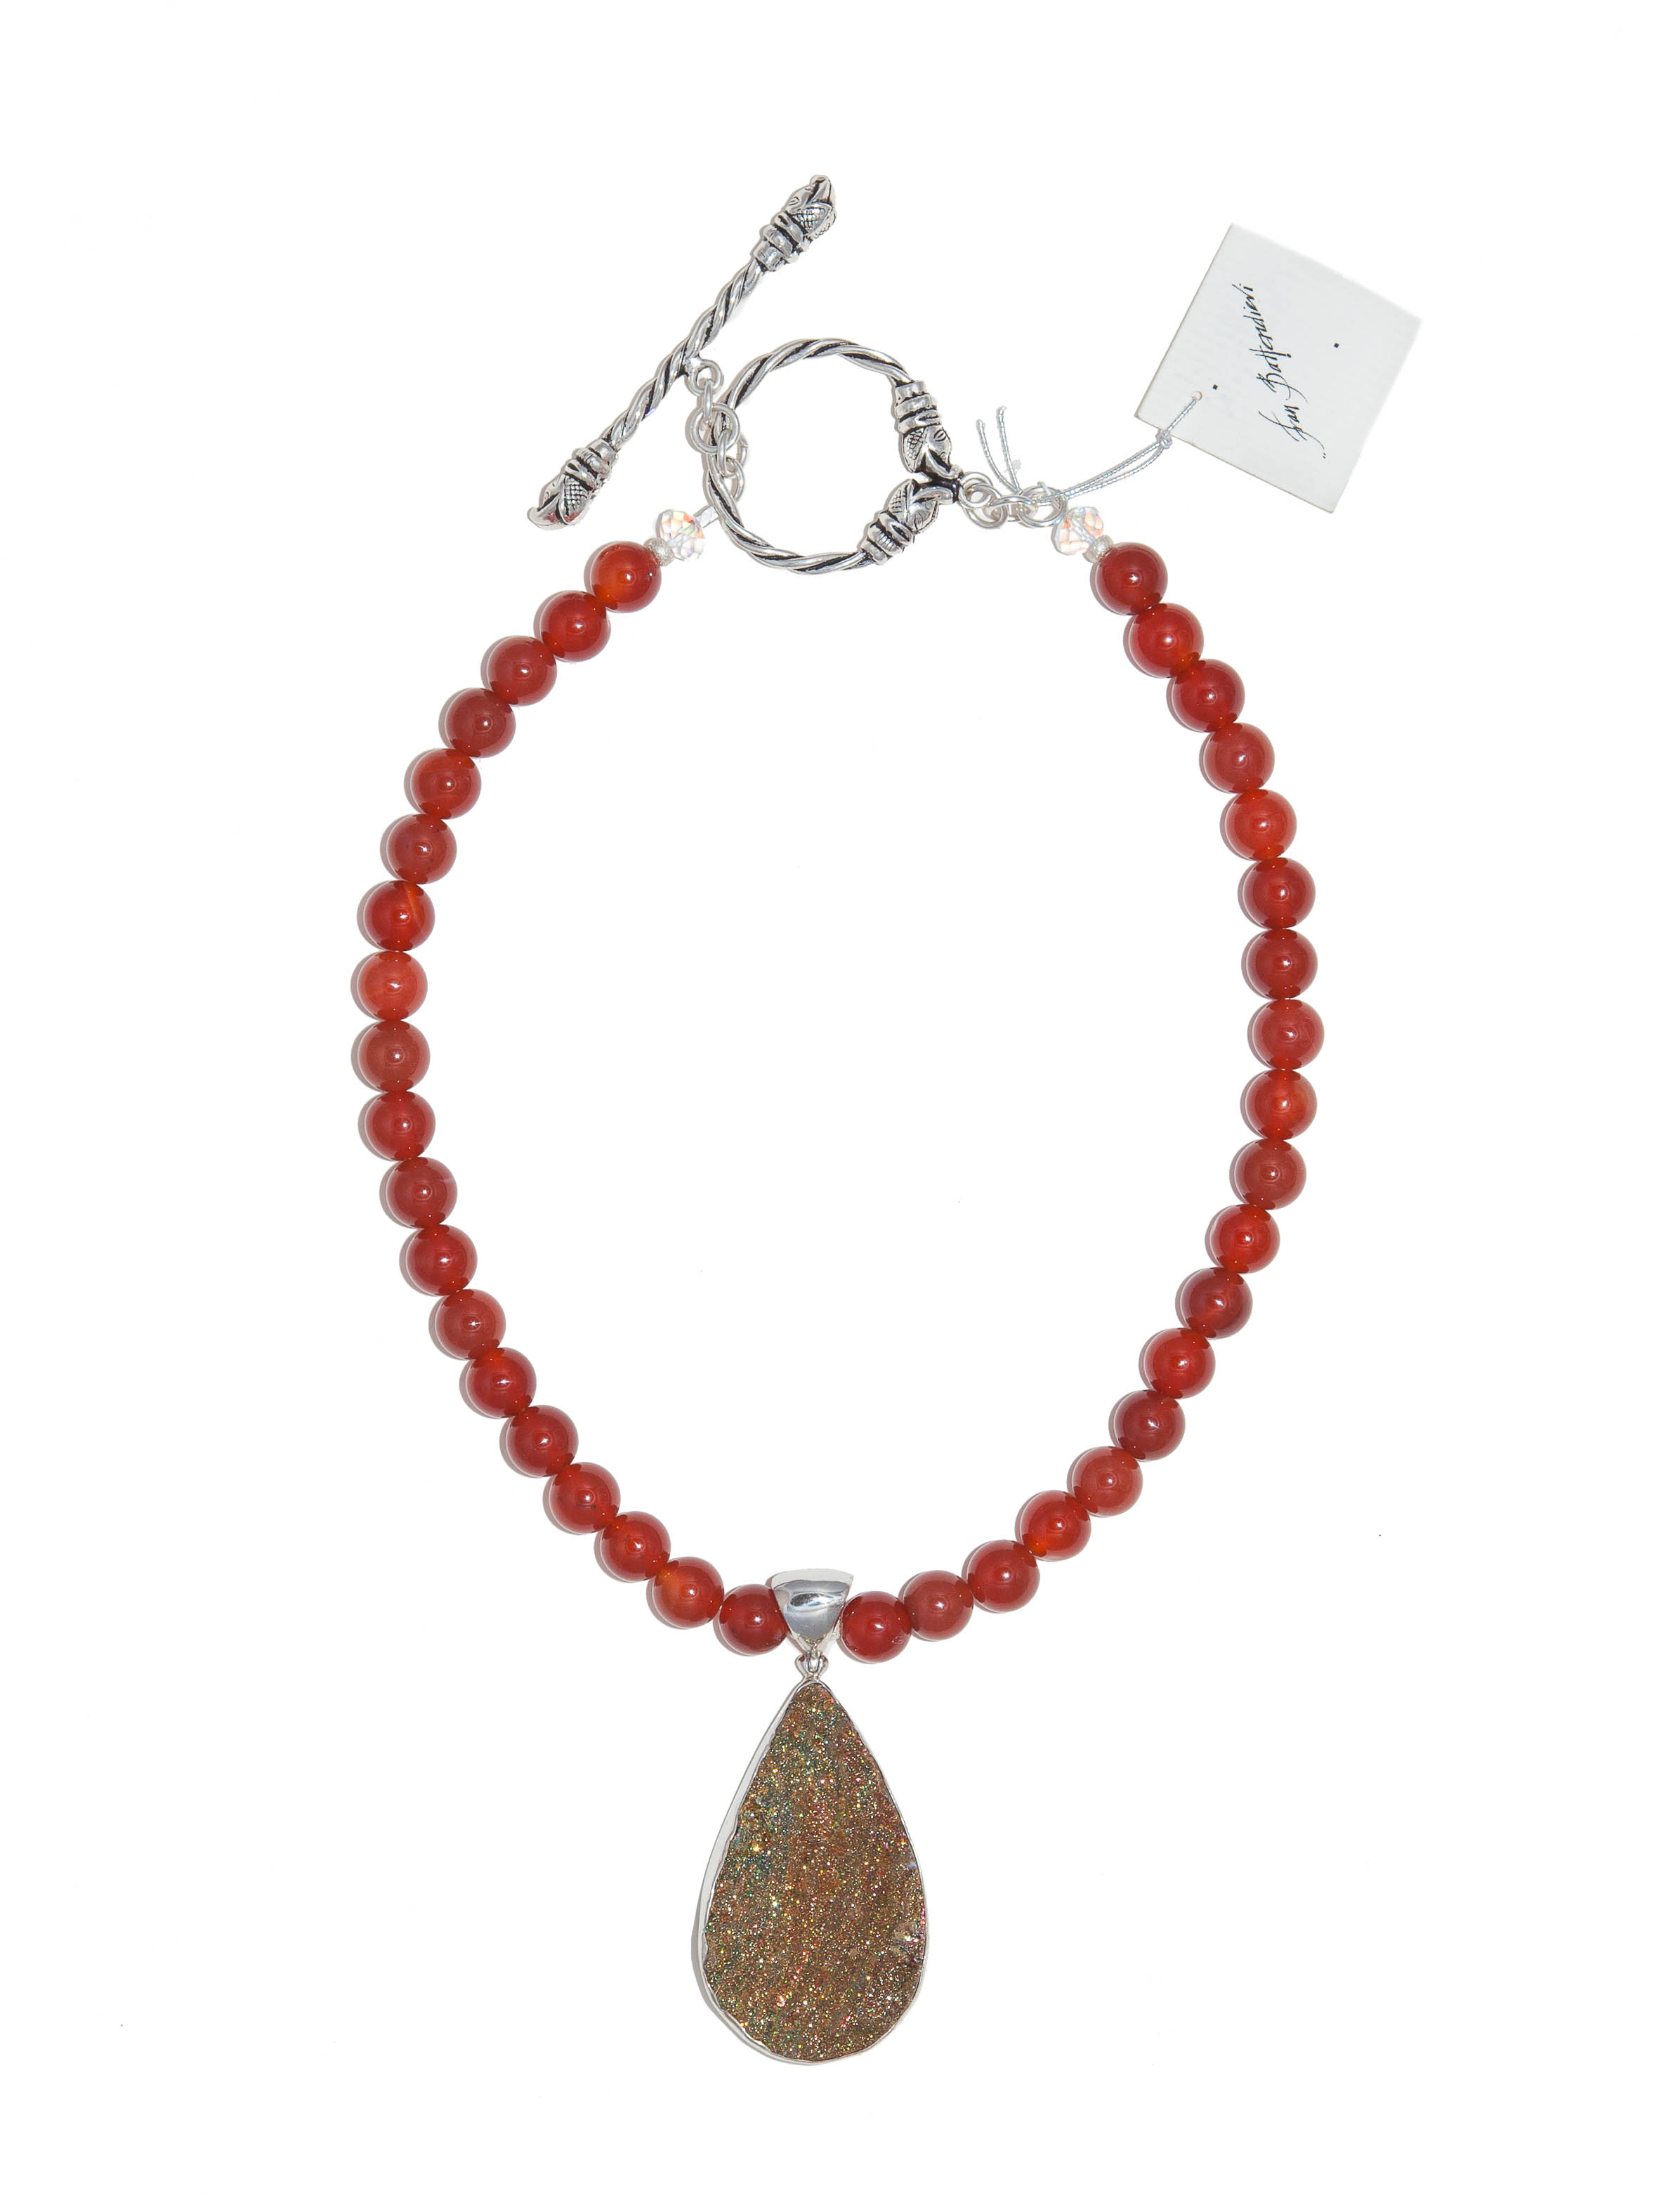 Carnelian Druze with Carnelian Beads